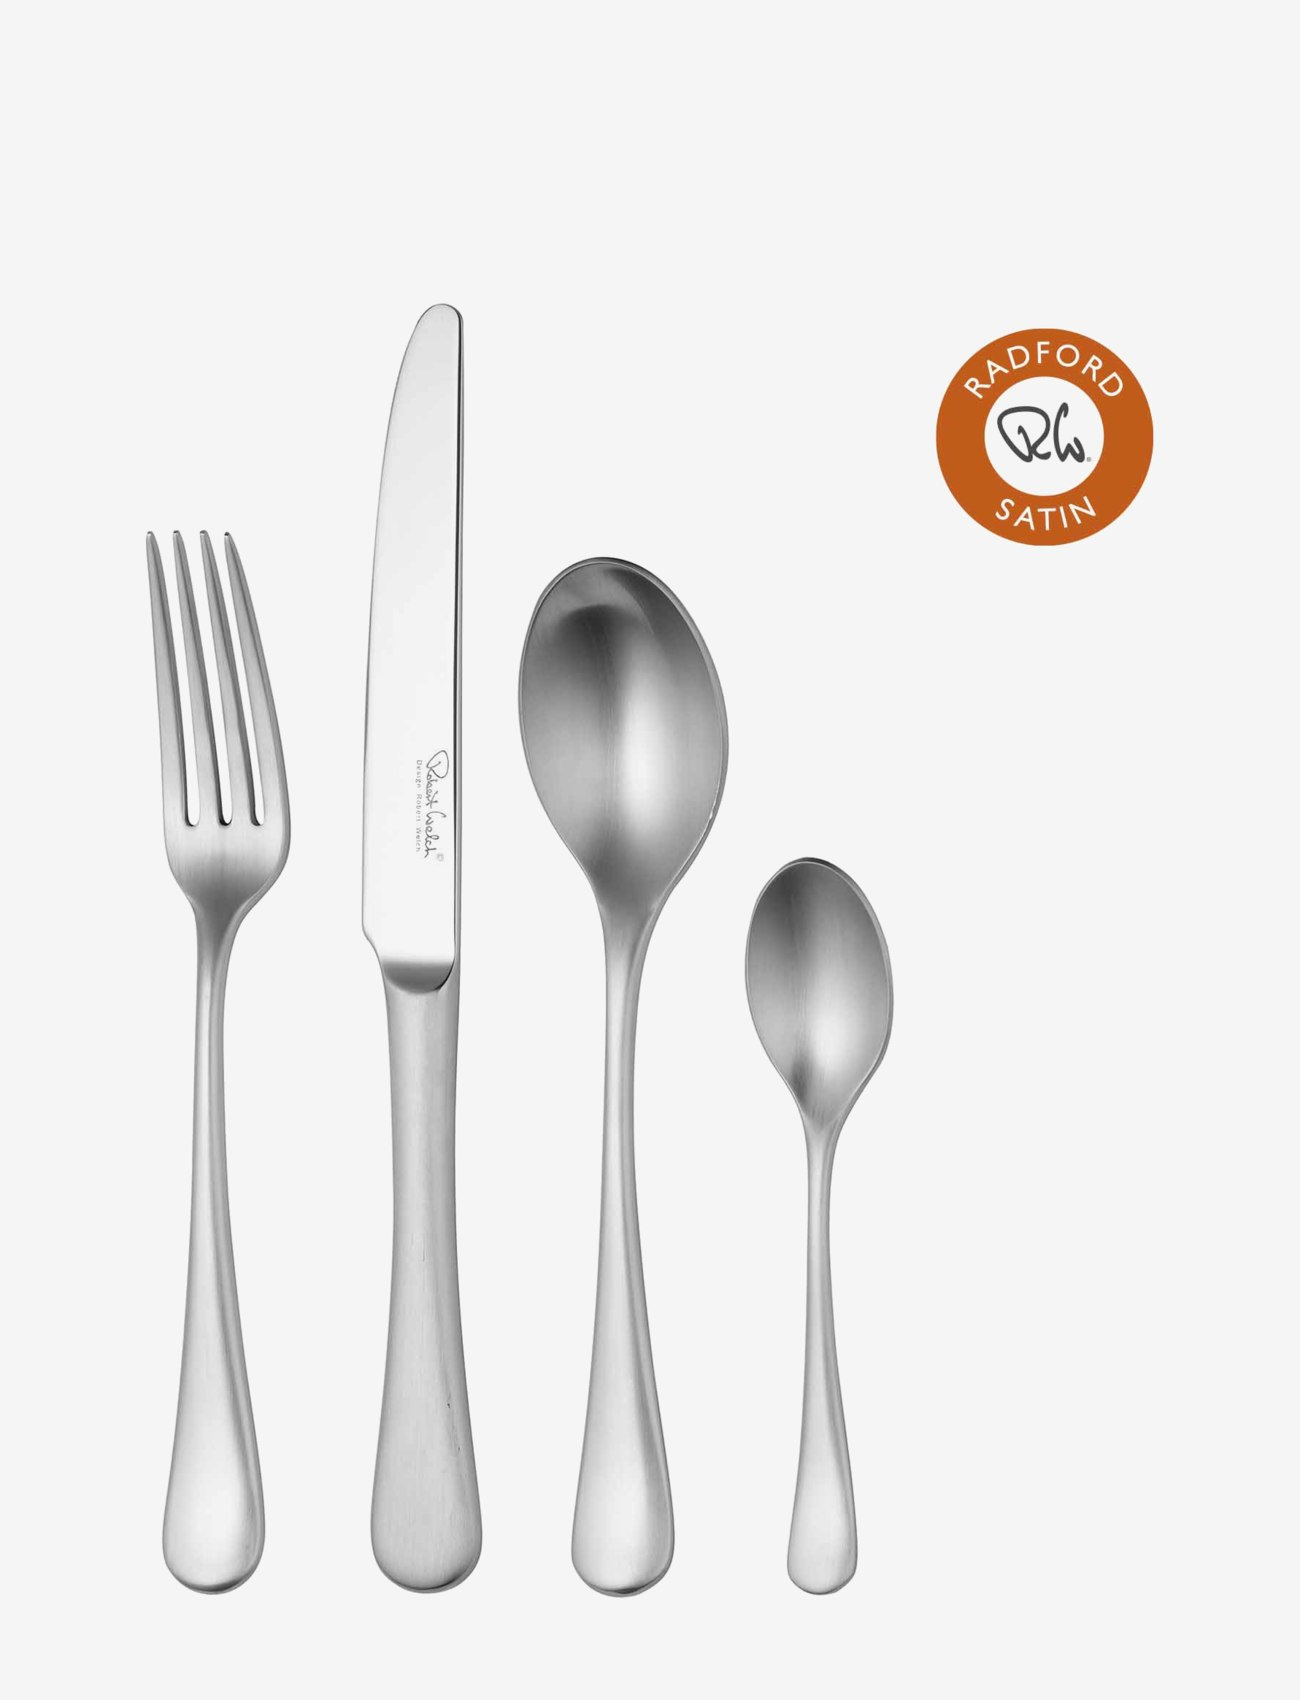 Robert Welch - Radford Satin Cutlery Set, 24 Piece for 6 People - bestikksett - multi colour - 0